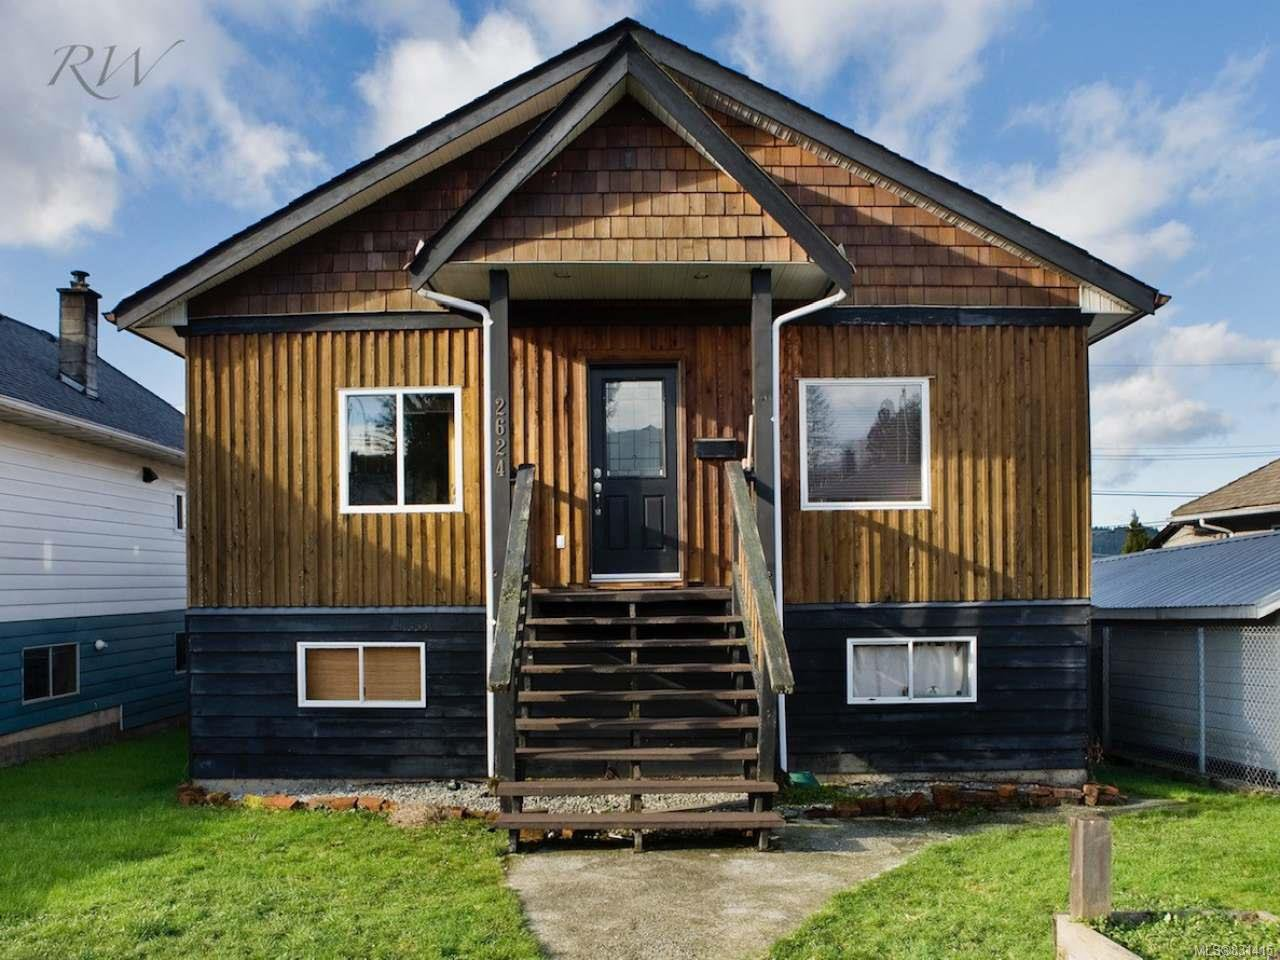 Main Photo: 2624 5th Ave in PORT ALBERNI: PA Port Alberni Single Family Detached for sale (Port Alberni)  : MLS®# 831415